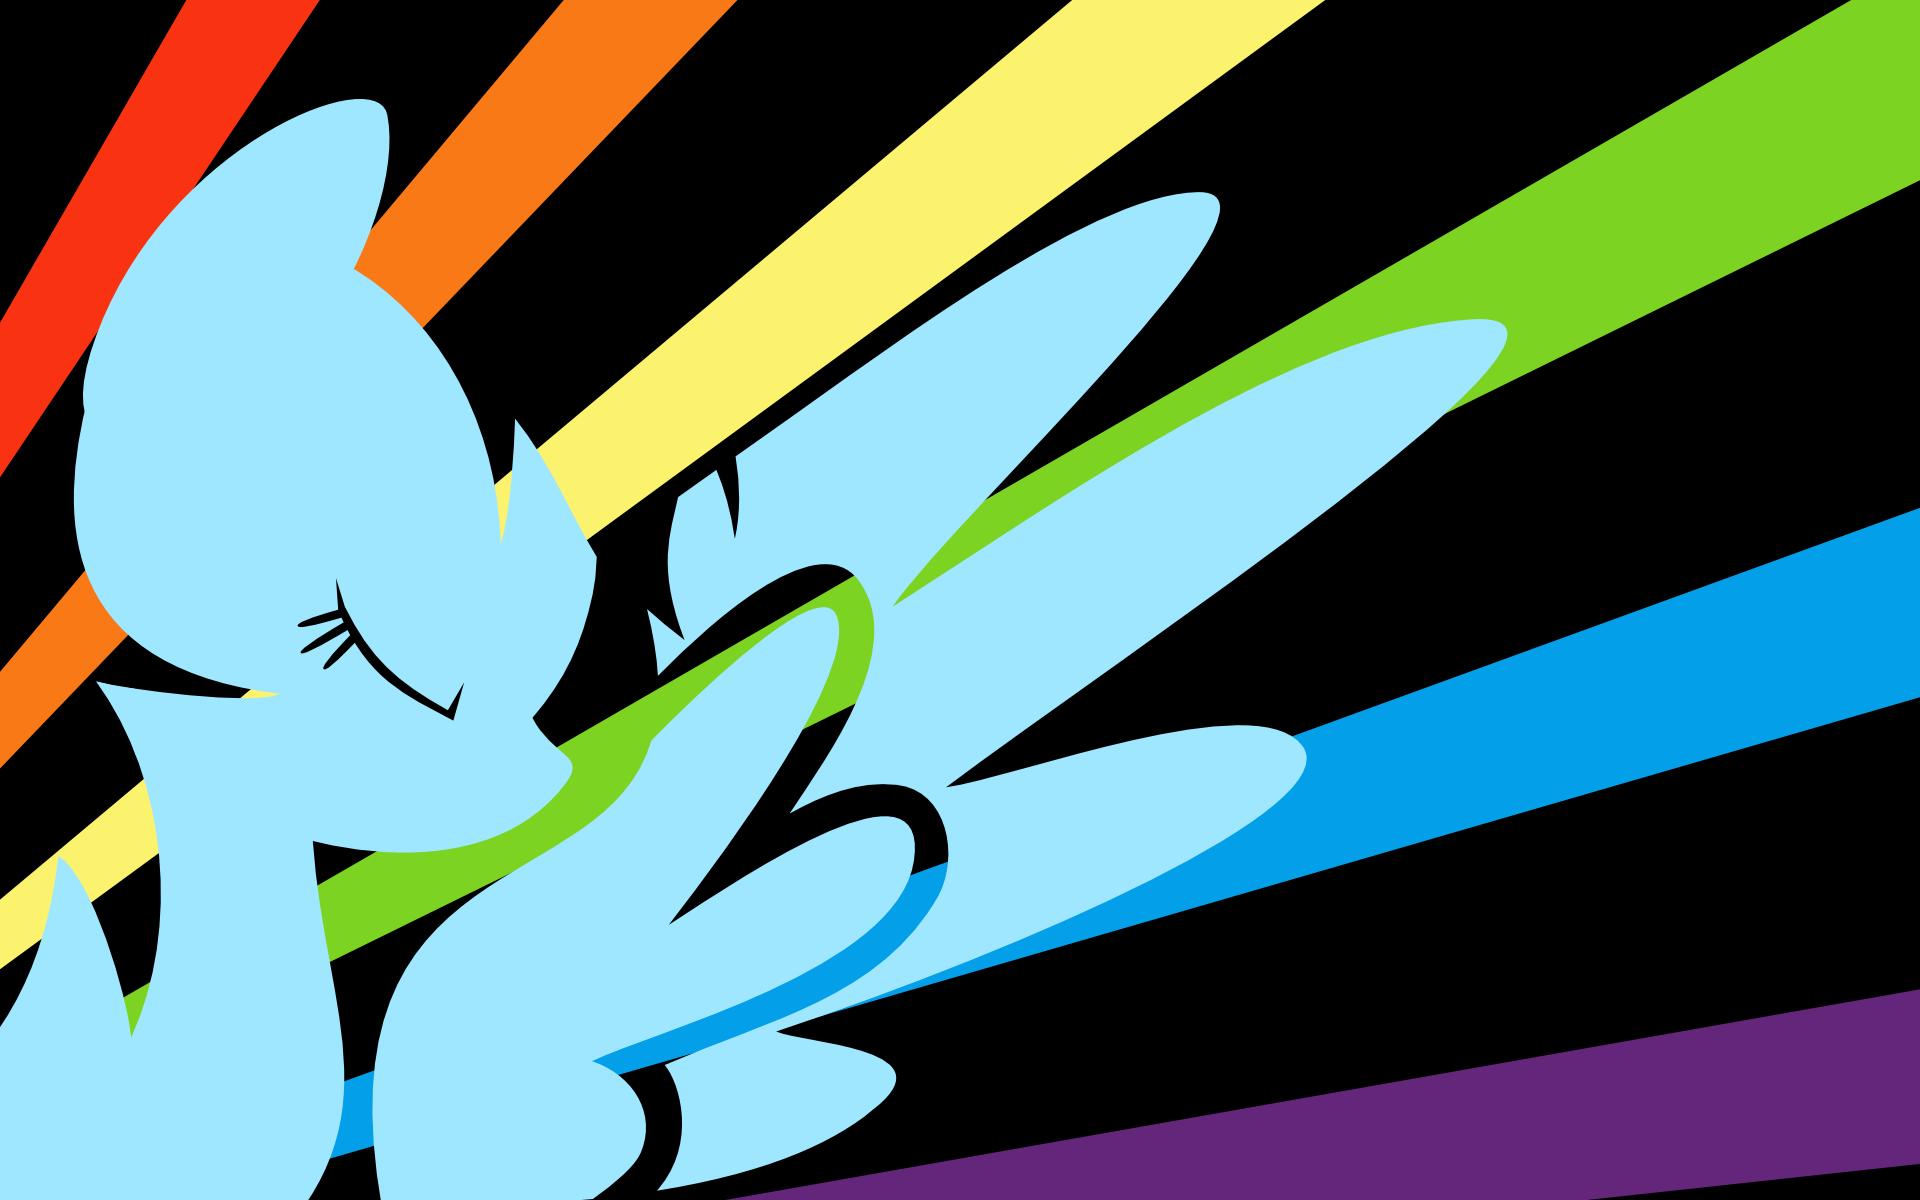 Mlp Rainbow Dash Wallpaper Hd Rainbow Dash 429158 Hd